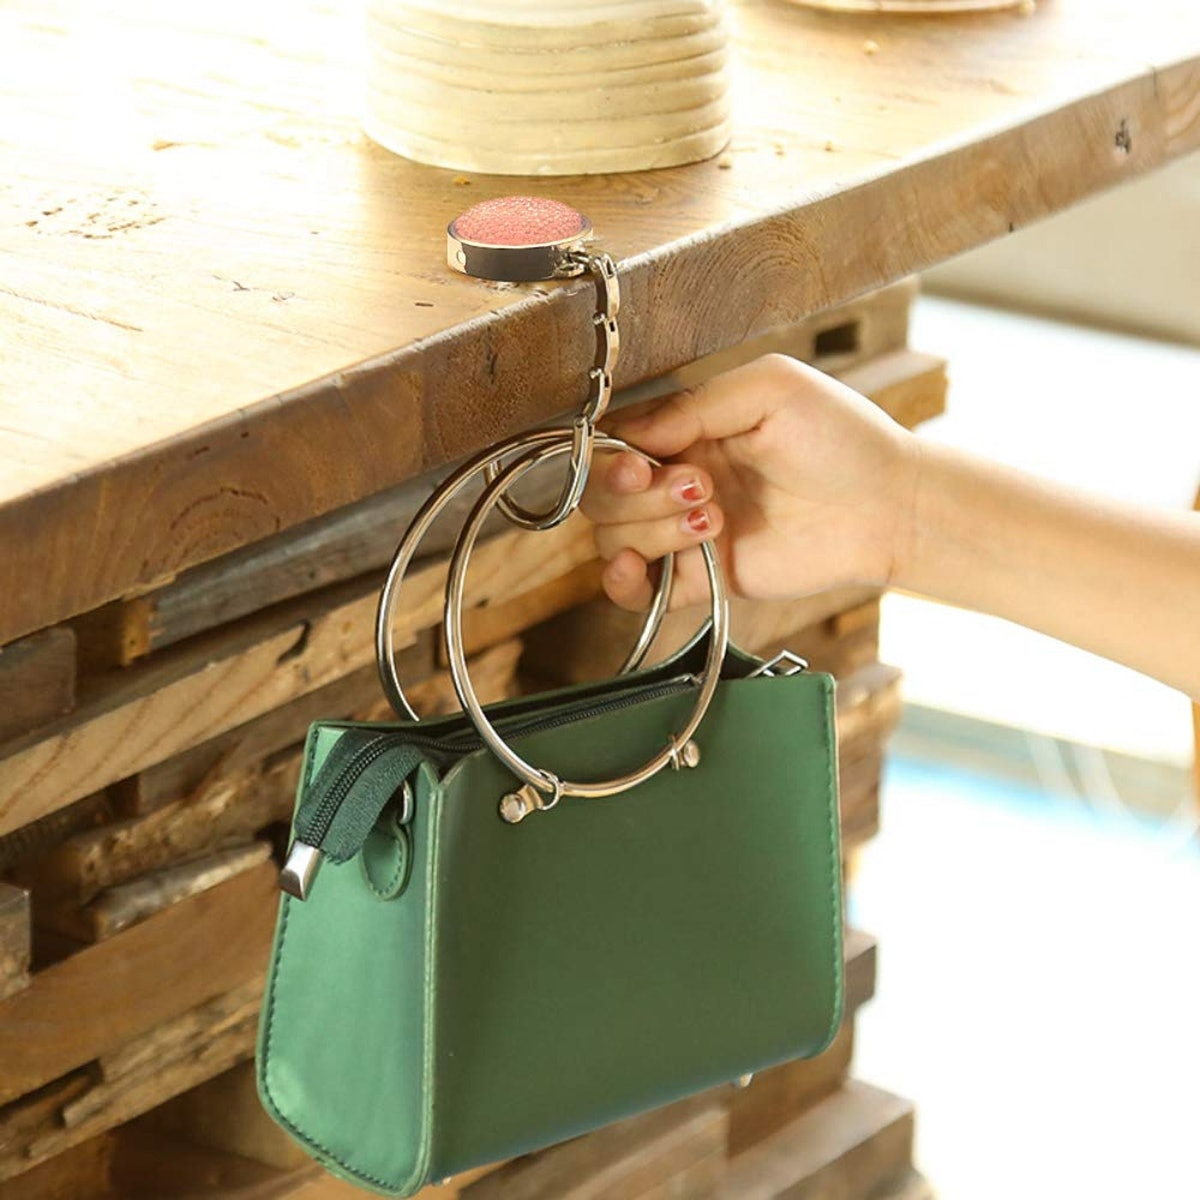 Milaloko Foldable Purse Hooks (3 Pack)